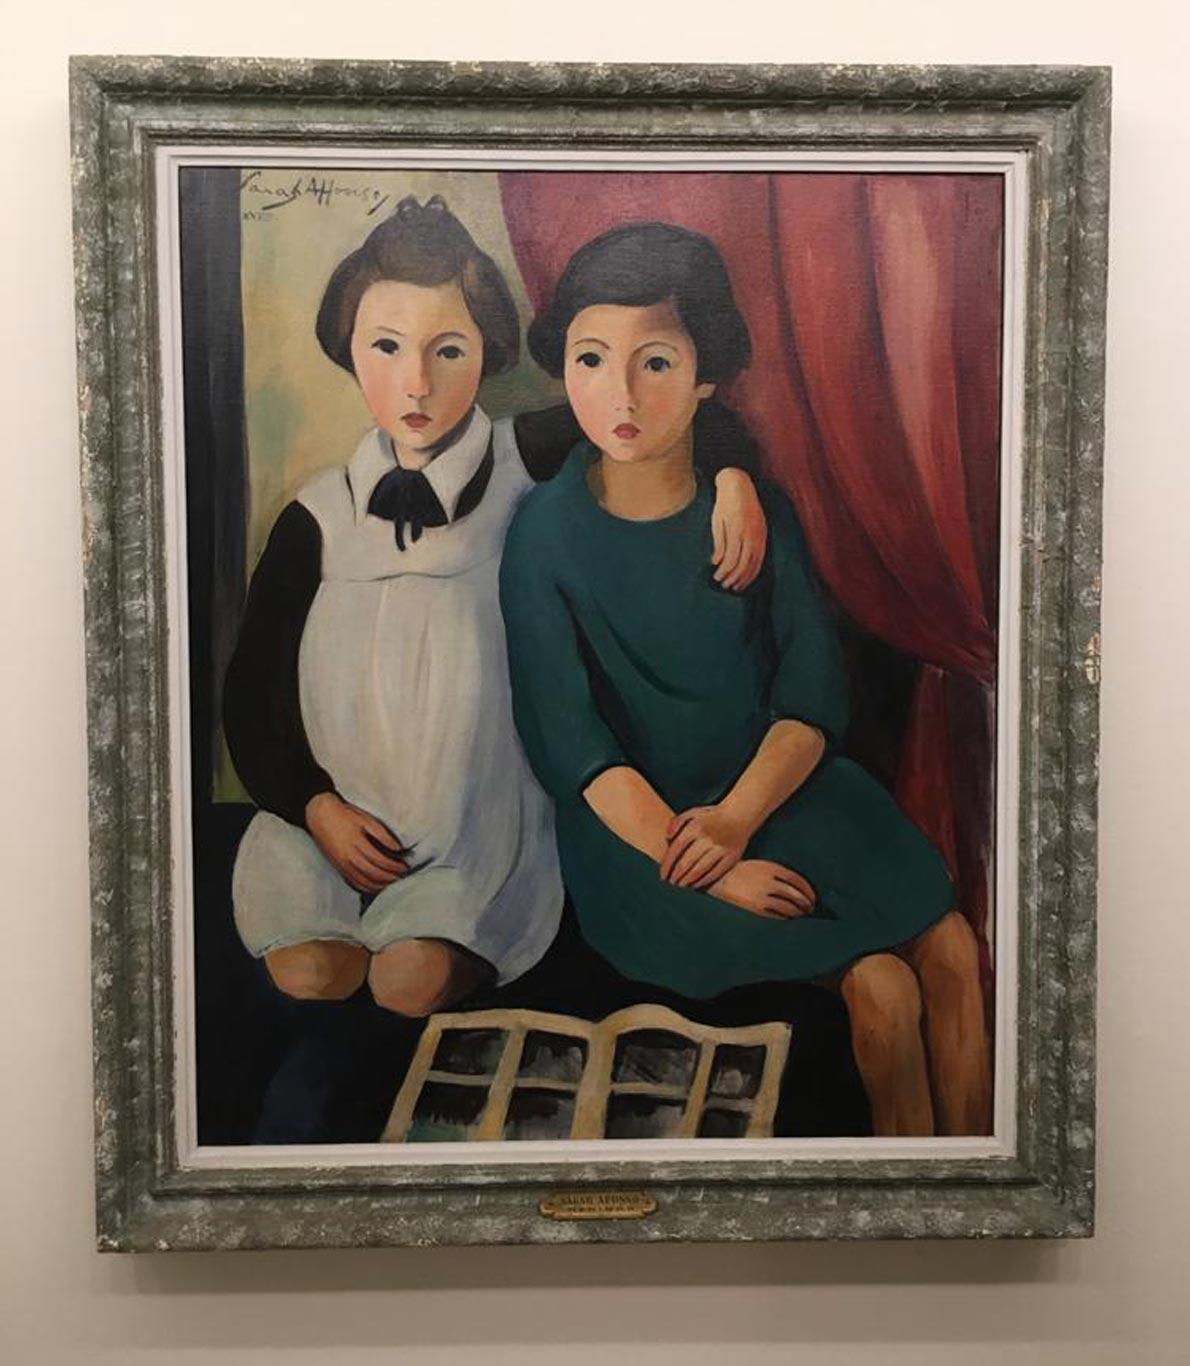 Pintura de duas meninas abraçadas.